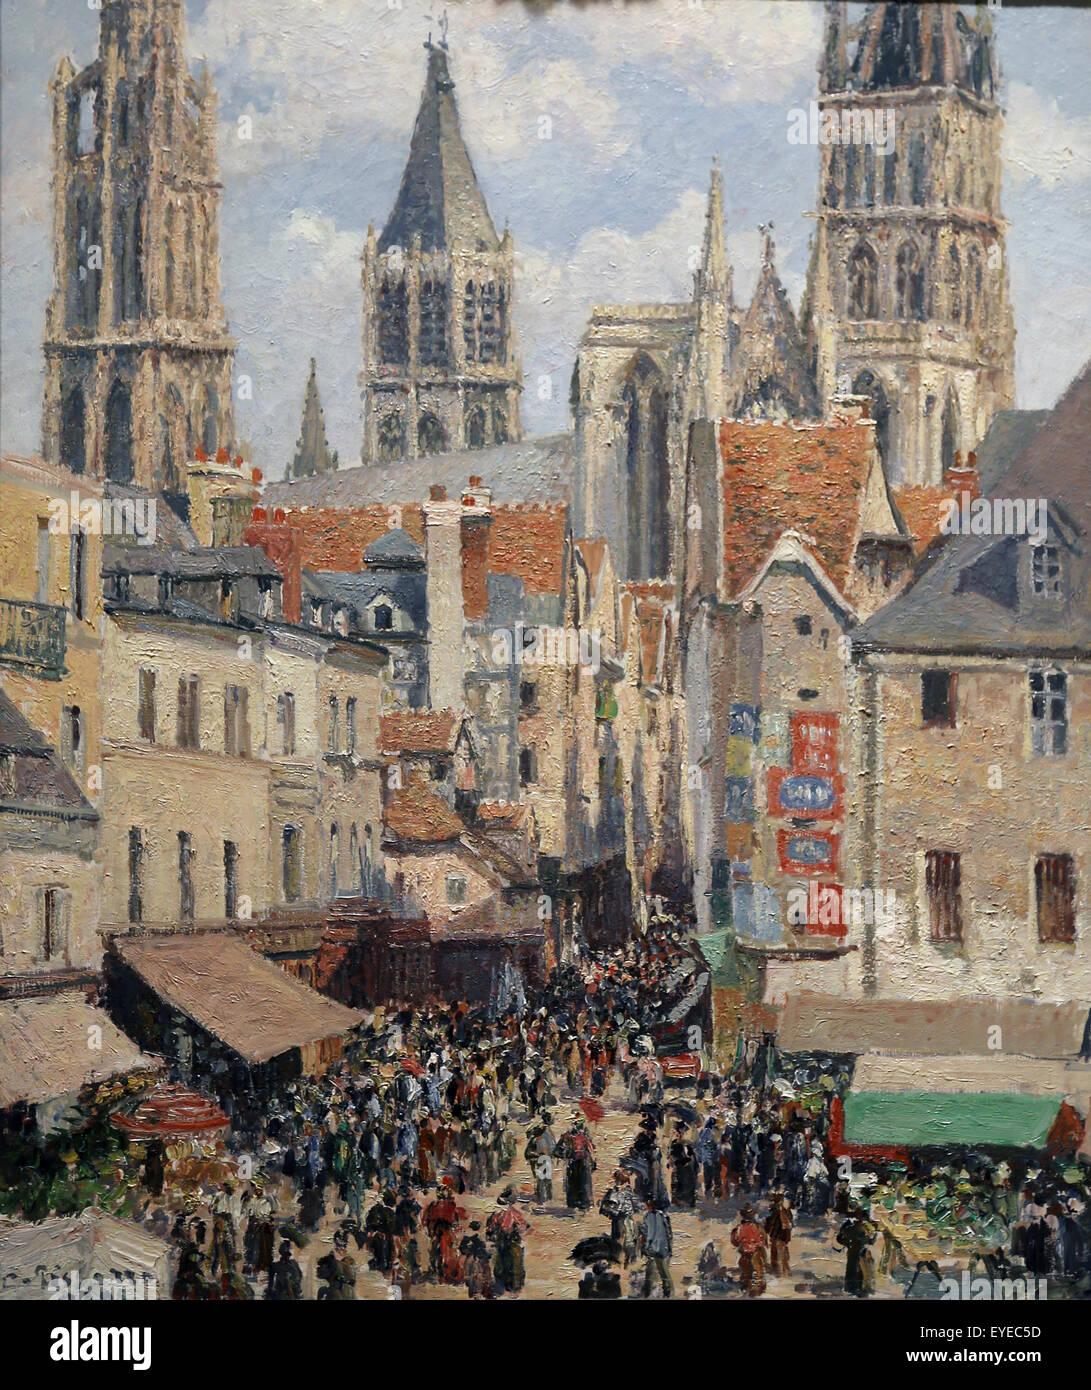 Camile Pissarro (1830-1903). French painter. Rue de l'Epicerie, Rouen (Effect of Sunlight), 1898. Oil on canvas. - Stock Image